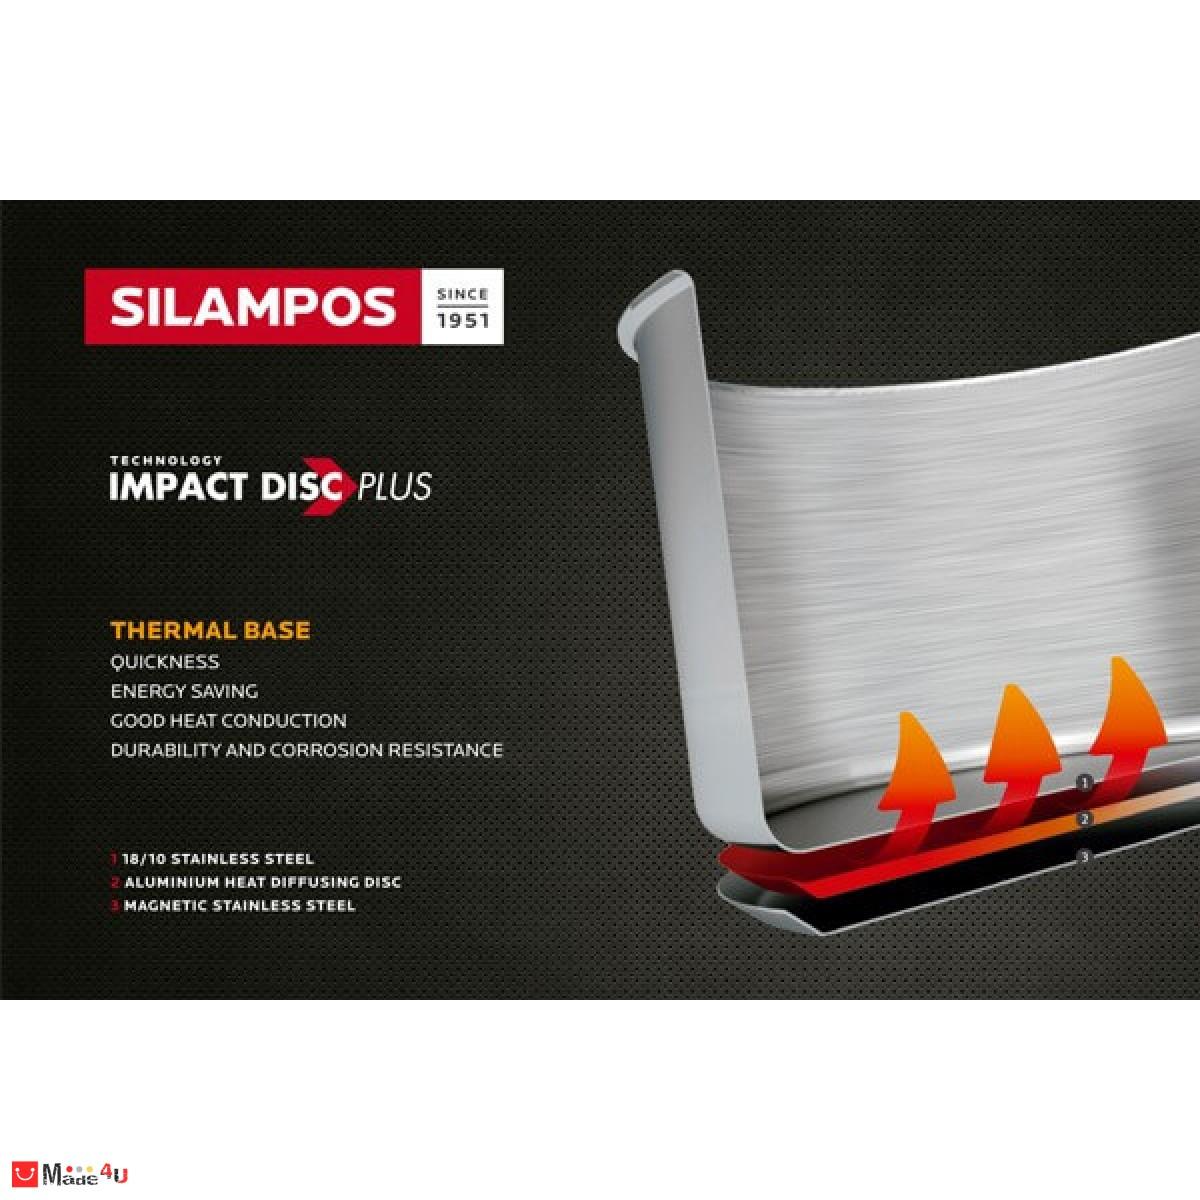 Тенджера под налягане STARTWIST 10л - марка SILAMPOS